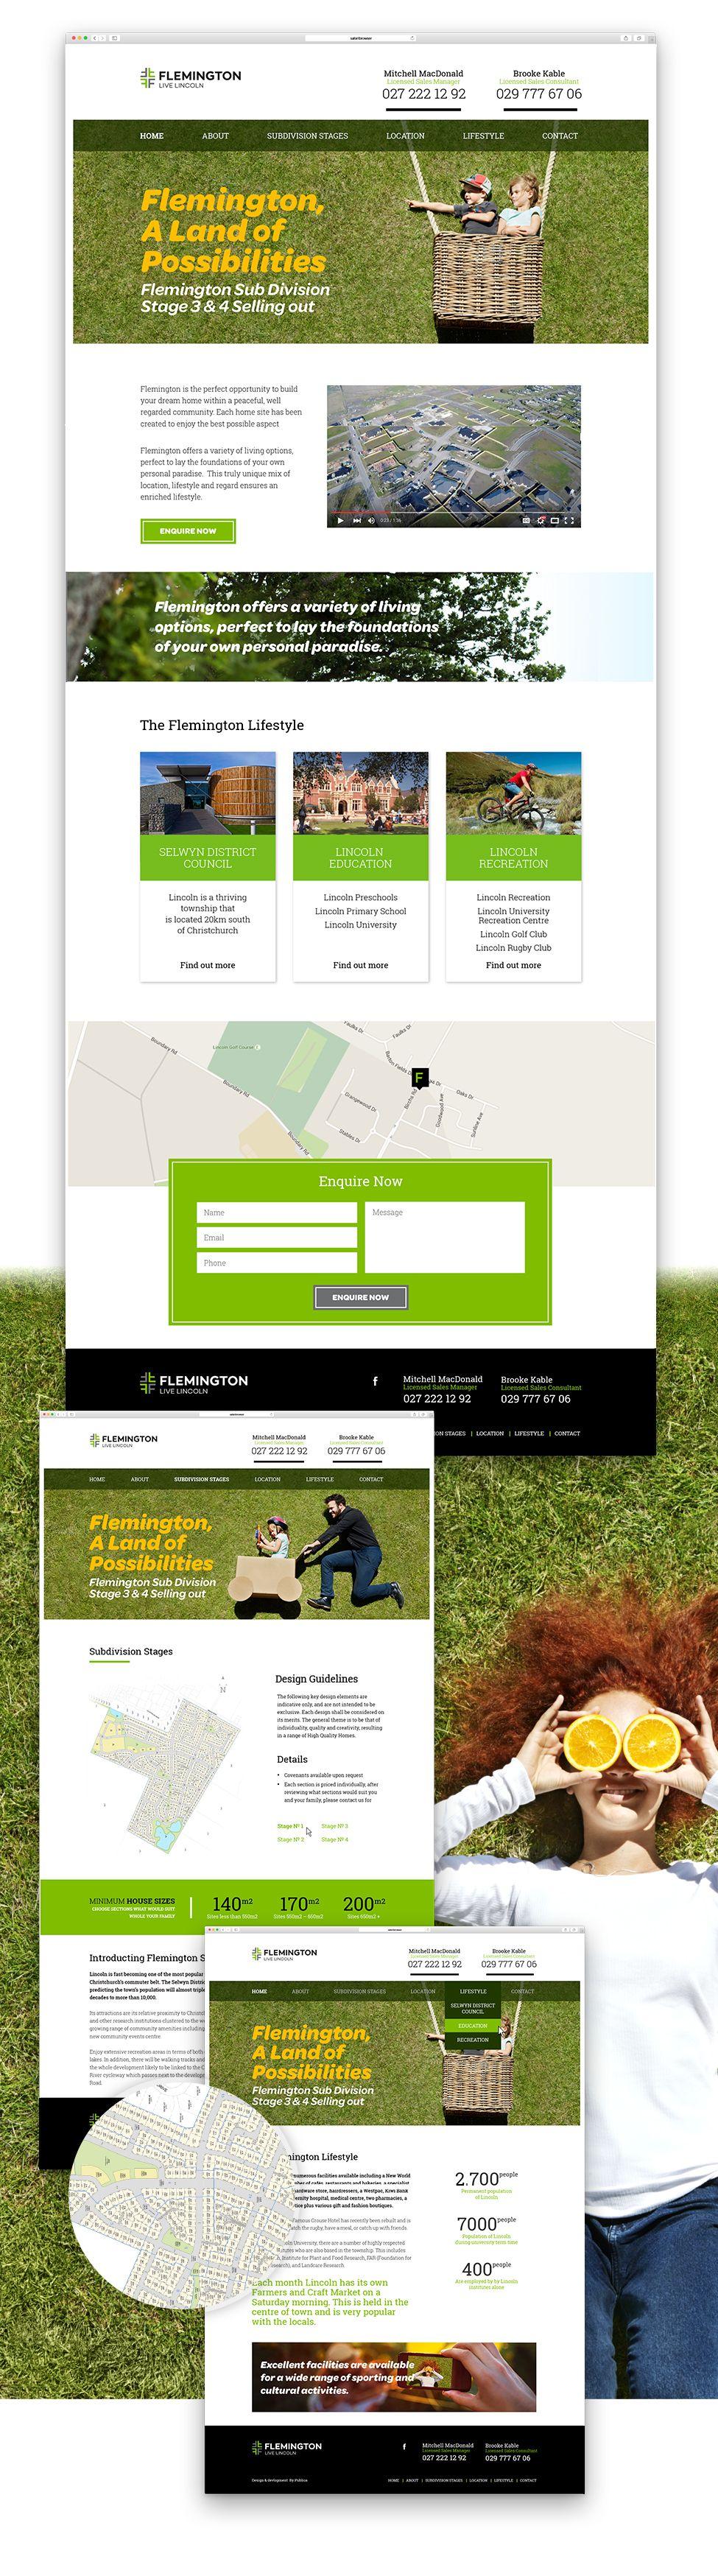 Flemington Publica Web Design Marketing Strategy Beautiful Design